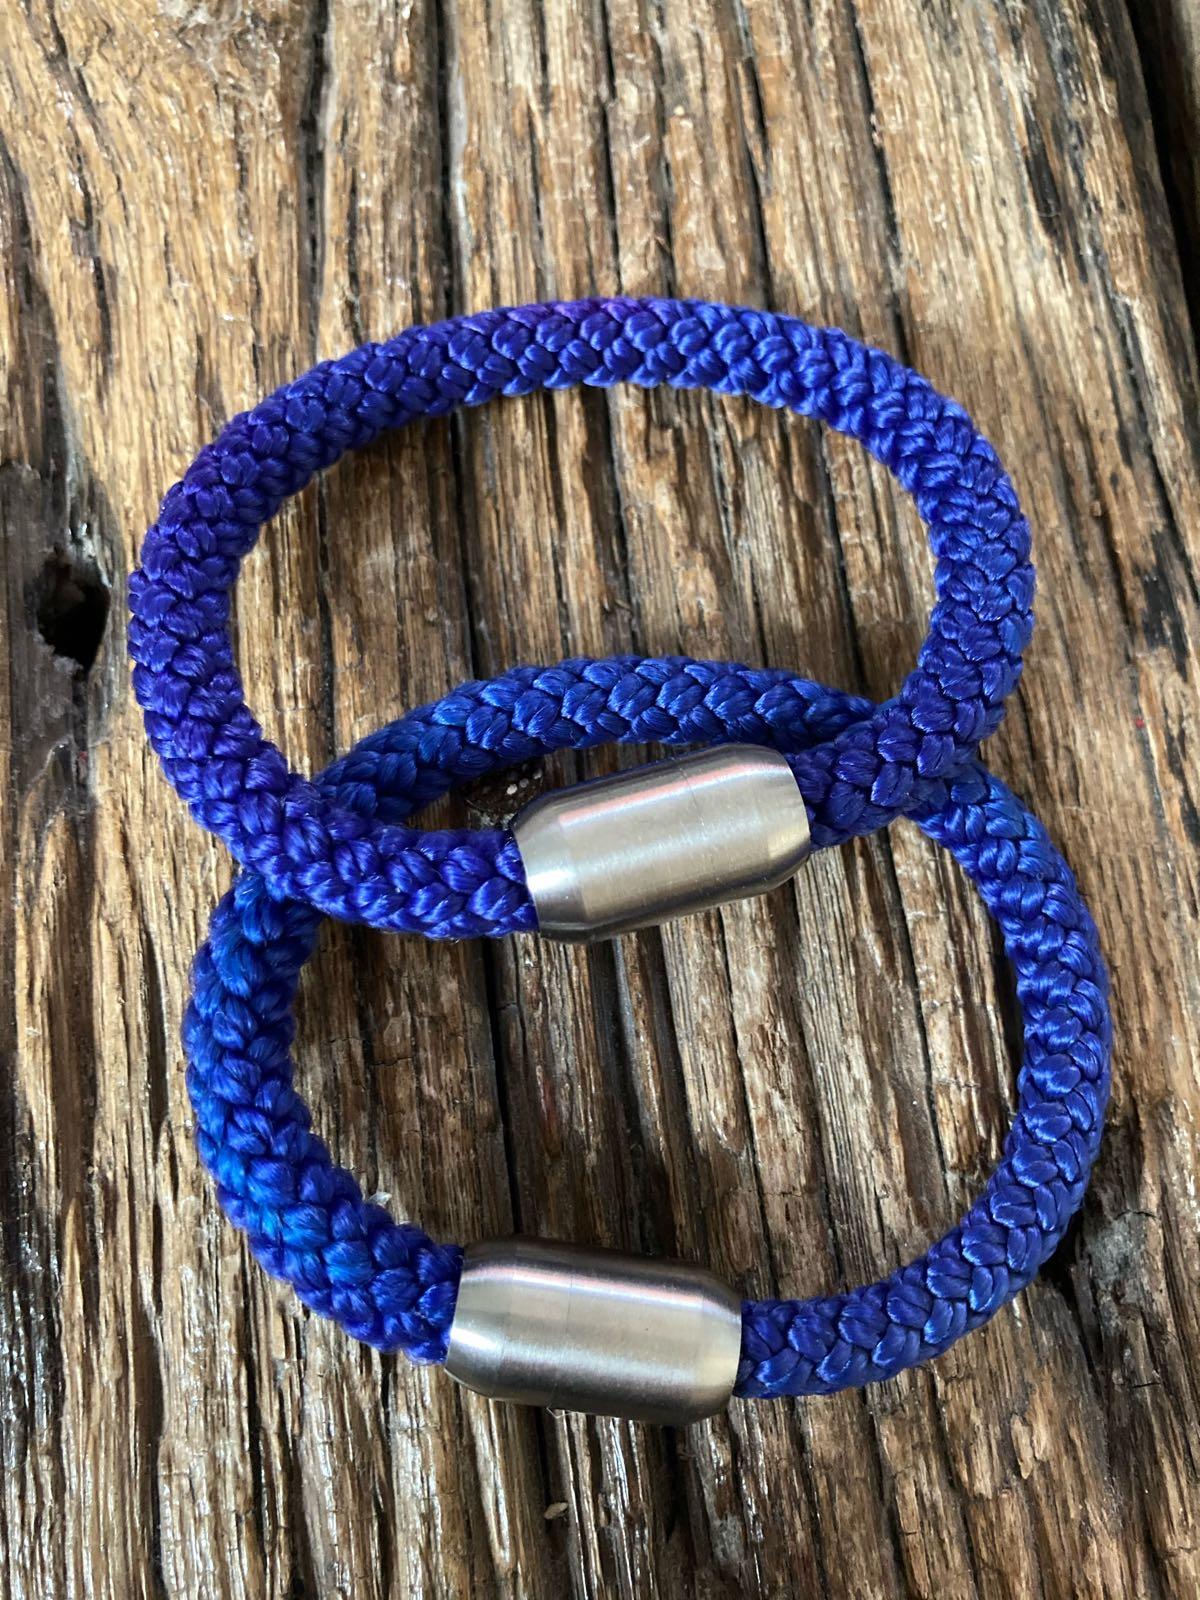 Fischereidesign - Armband royalblau, 9 mm, Edelstahlverschluss silber